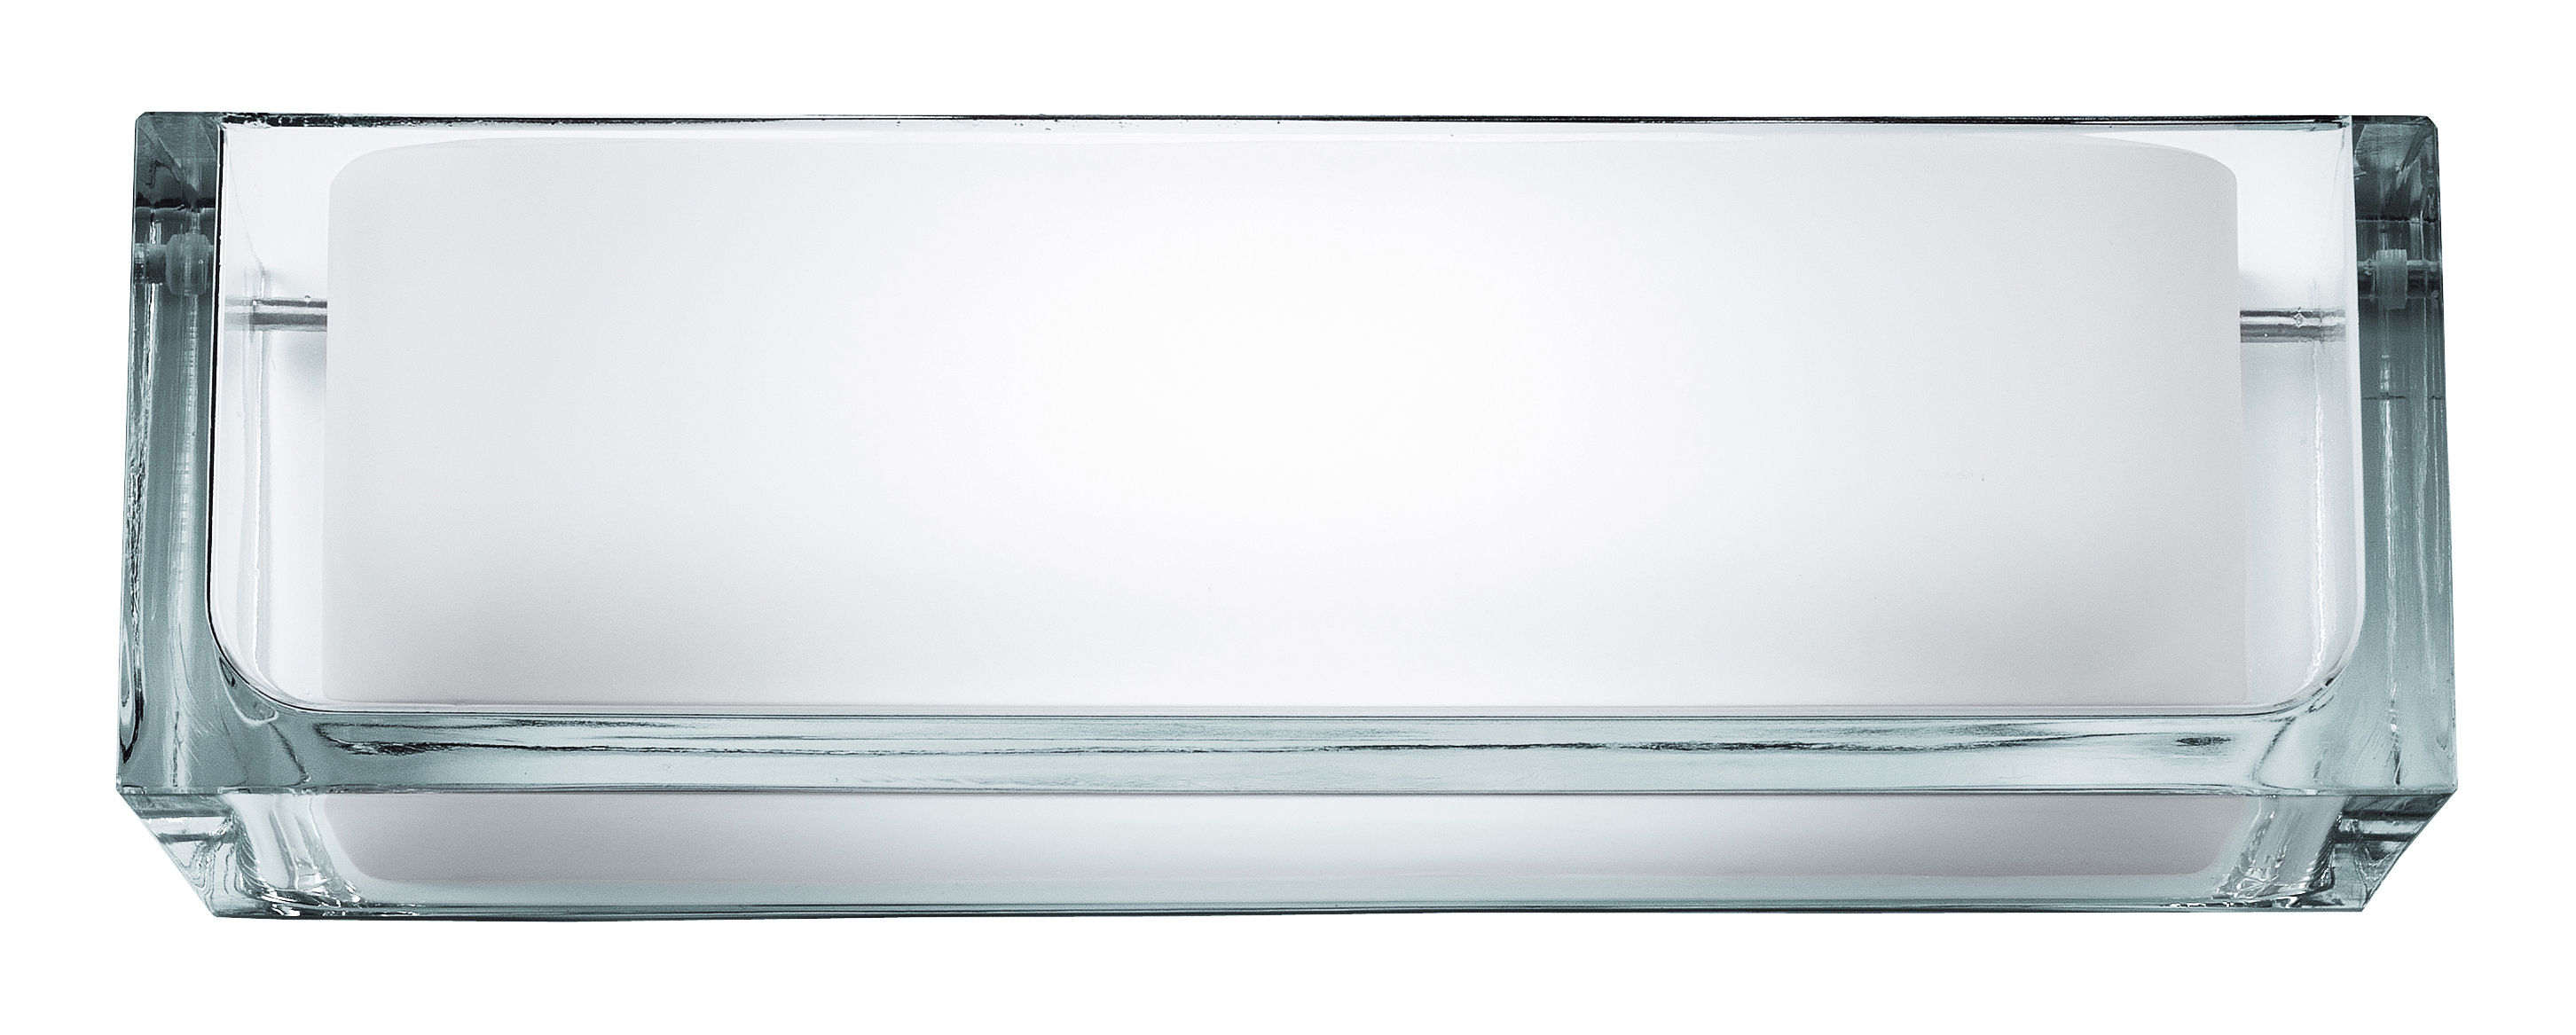 Leuchten - Wandleuchten - Ontherocks 1 HL Wandleuchte - Flos - Glas - Glas